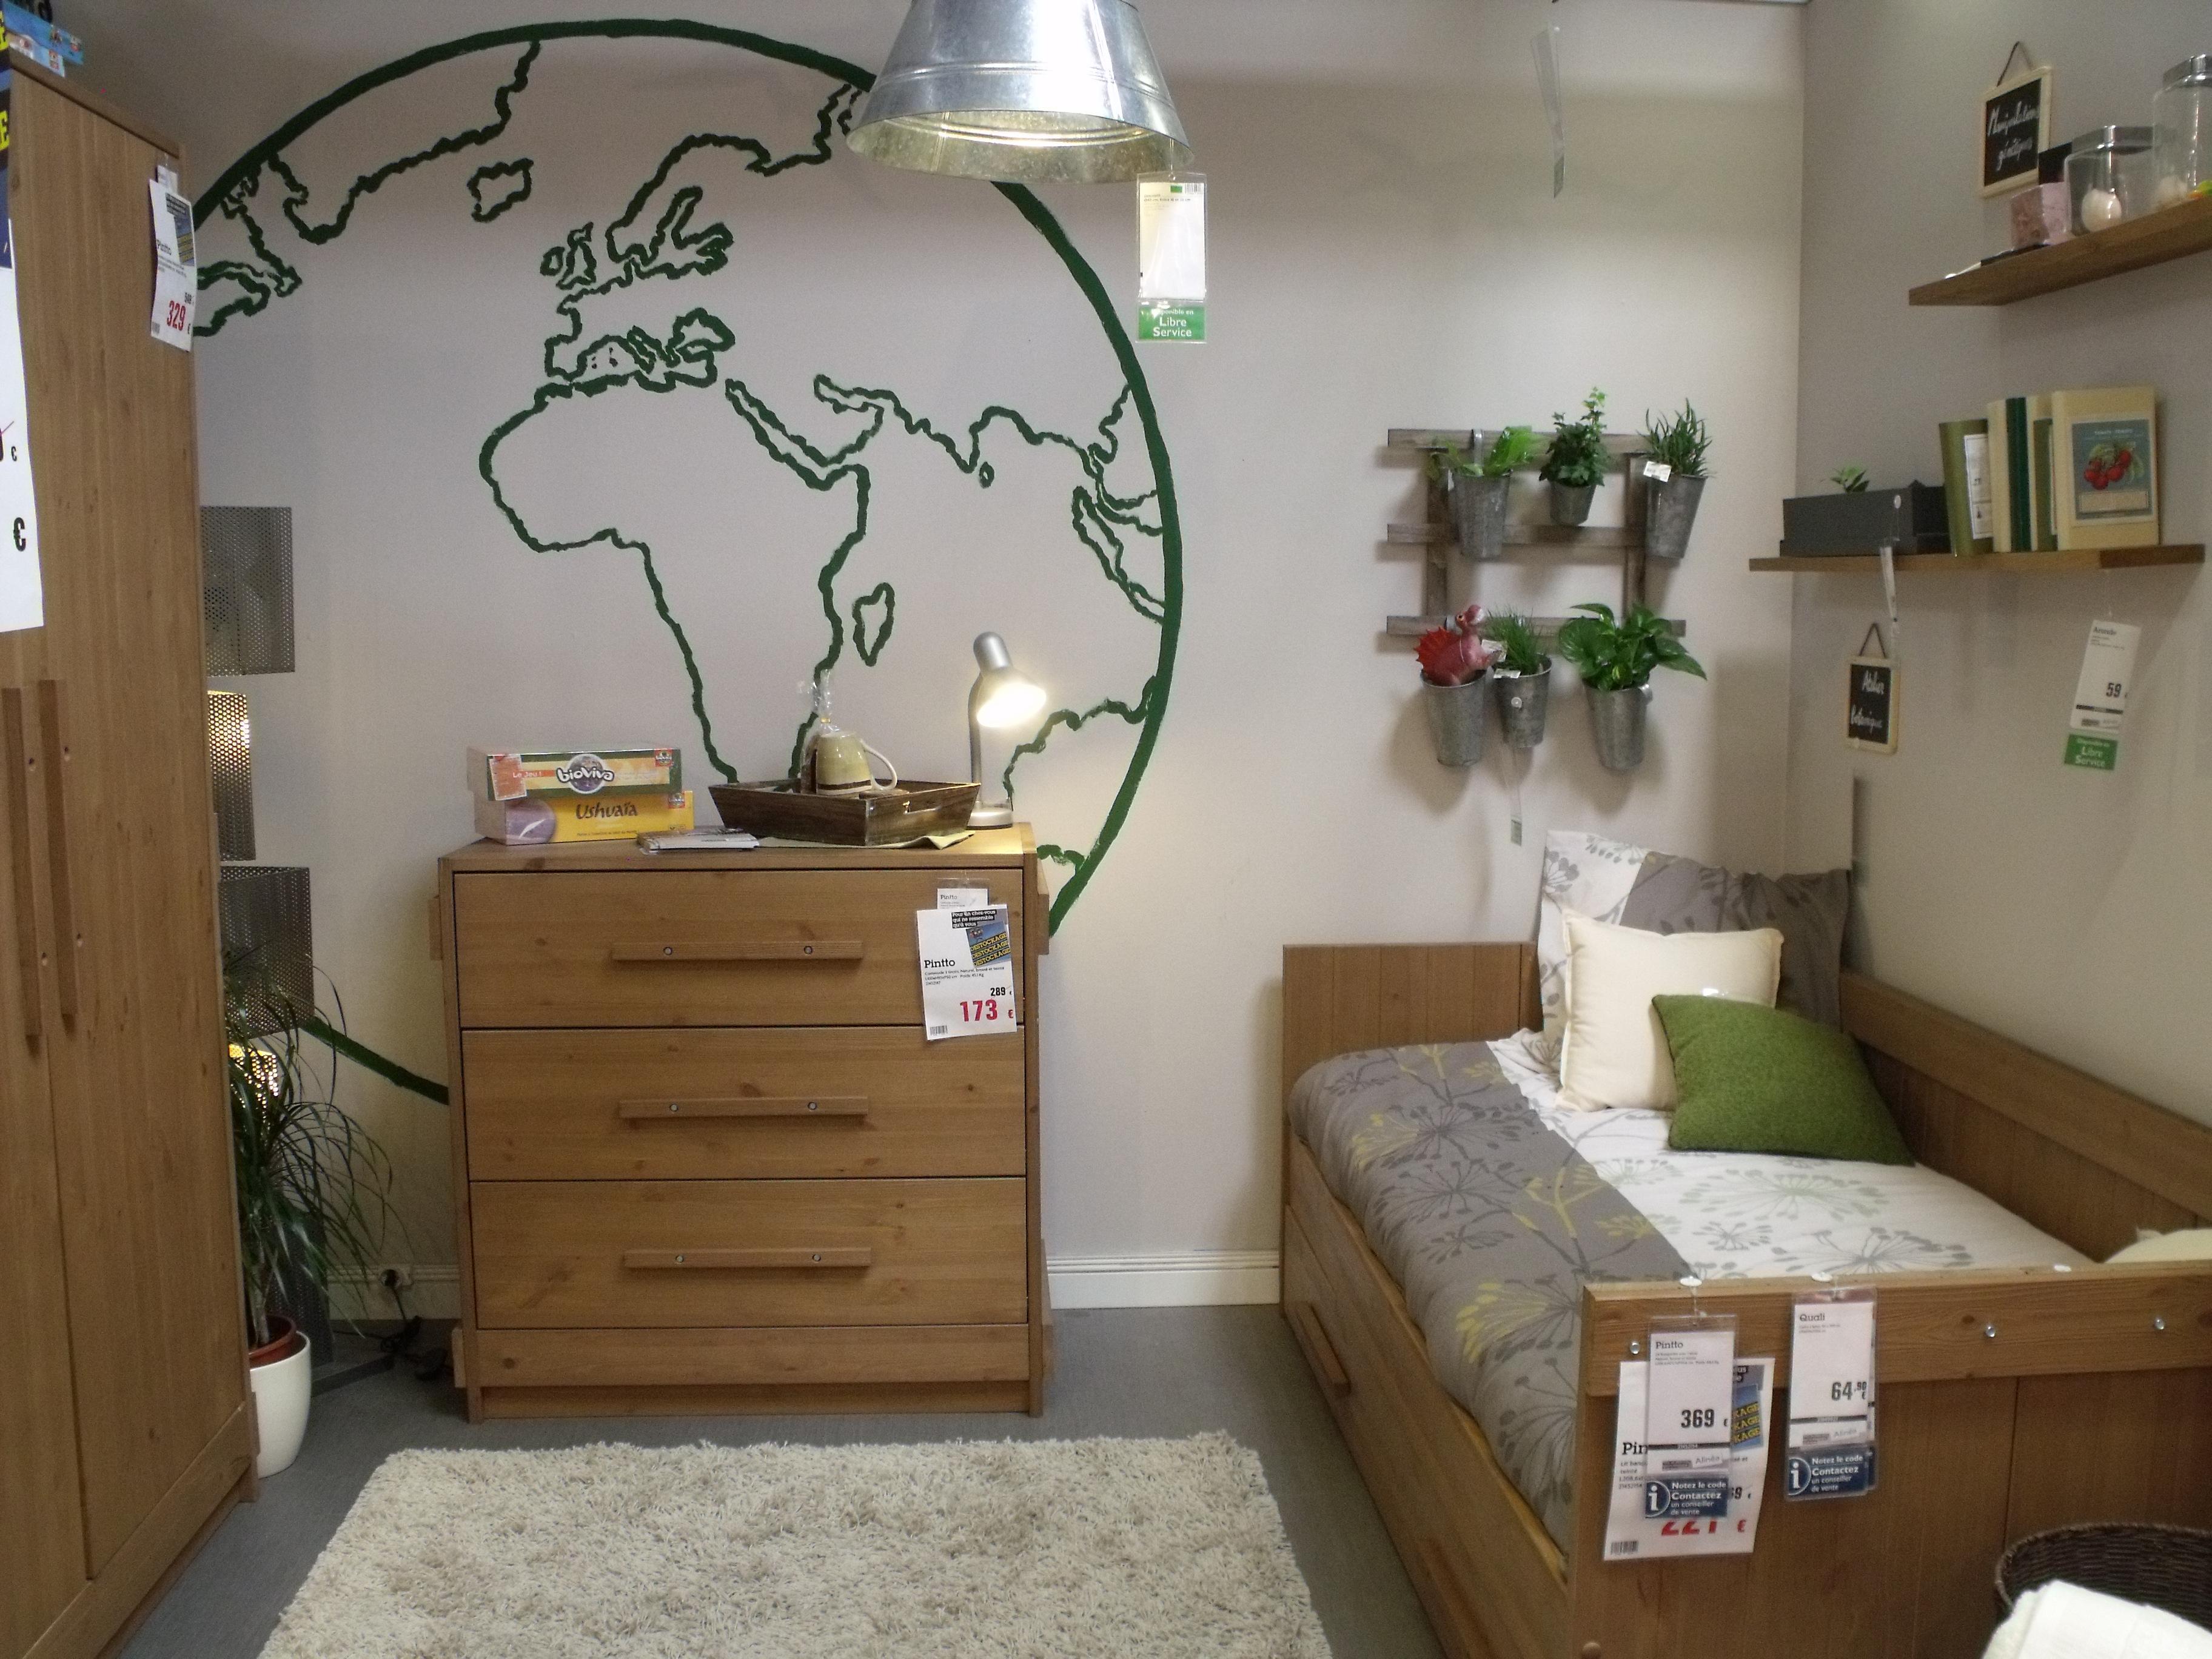 d coration de chambre d enfant. Black Bedroom Furniture Sets. Home Design Ideas